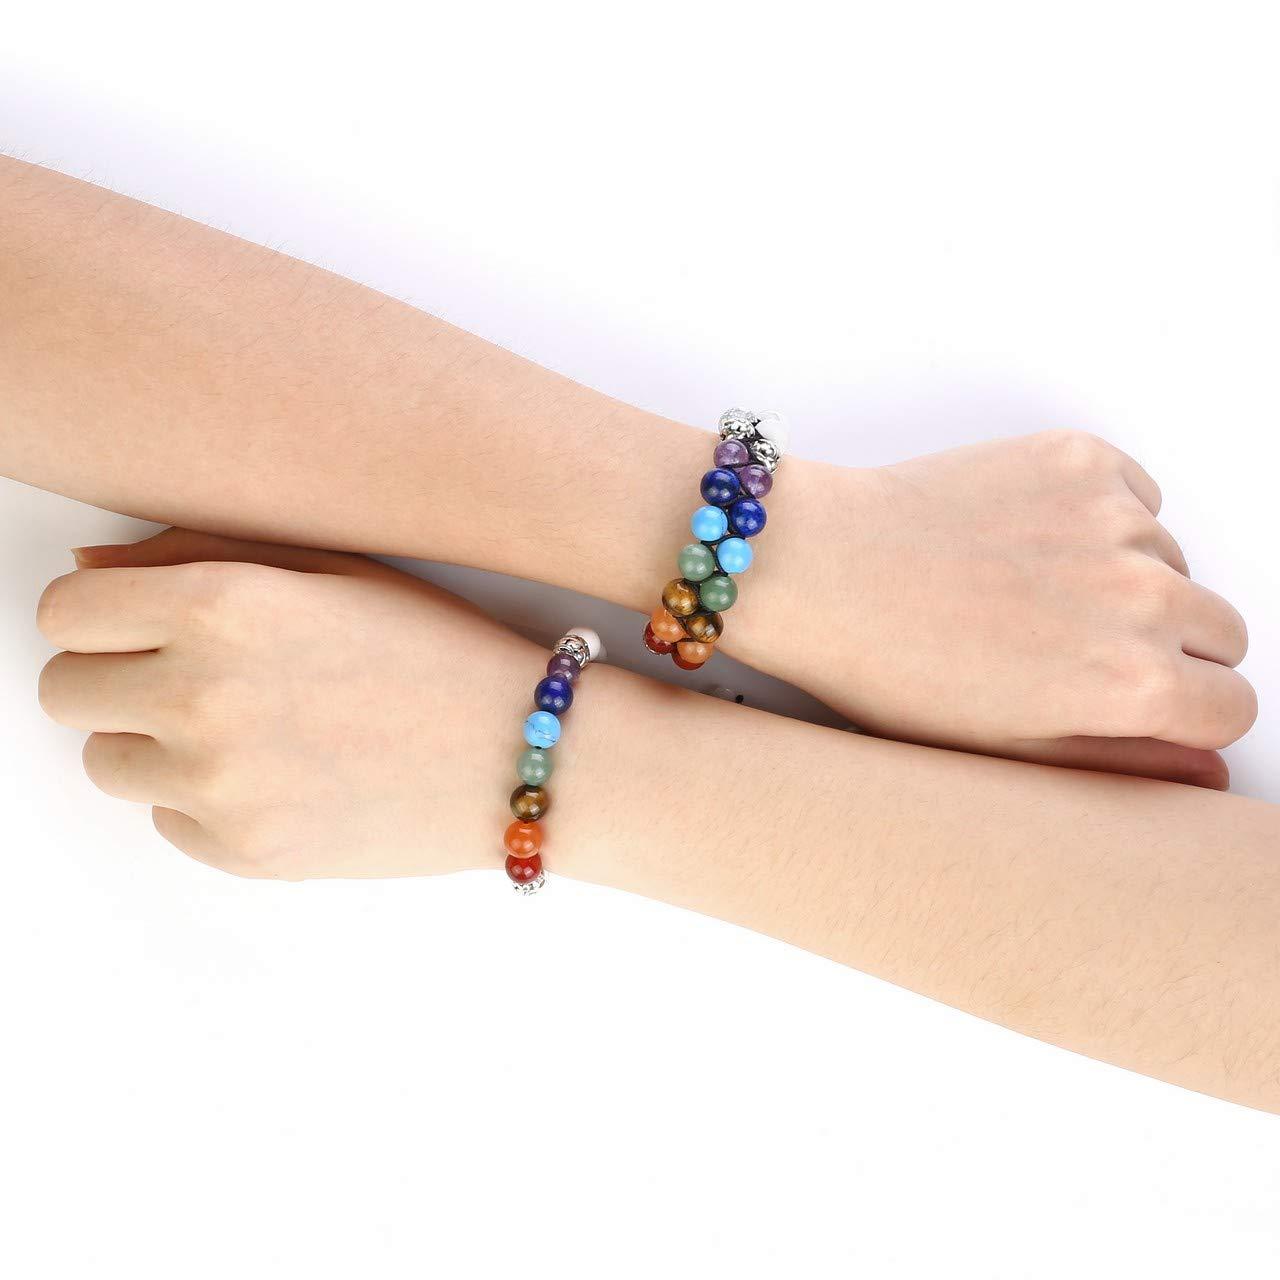 Top Plaza 7 Chakra Bead Bracelet Reiki Healing Crystals Yoga Stone Anxiety Braided Couples Bracelets for Womens Mens